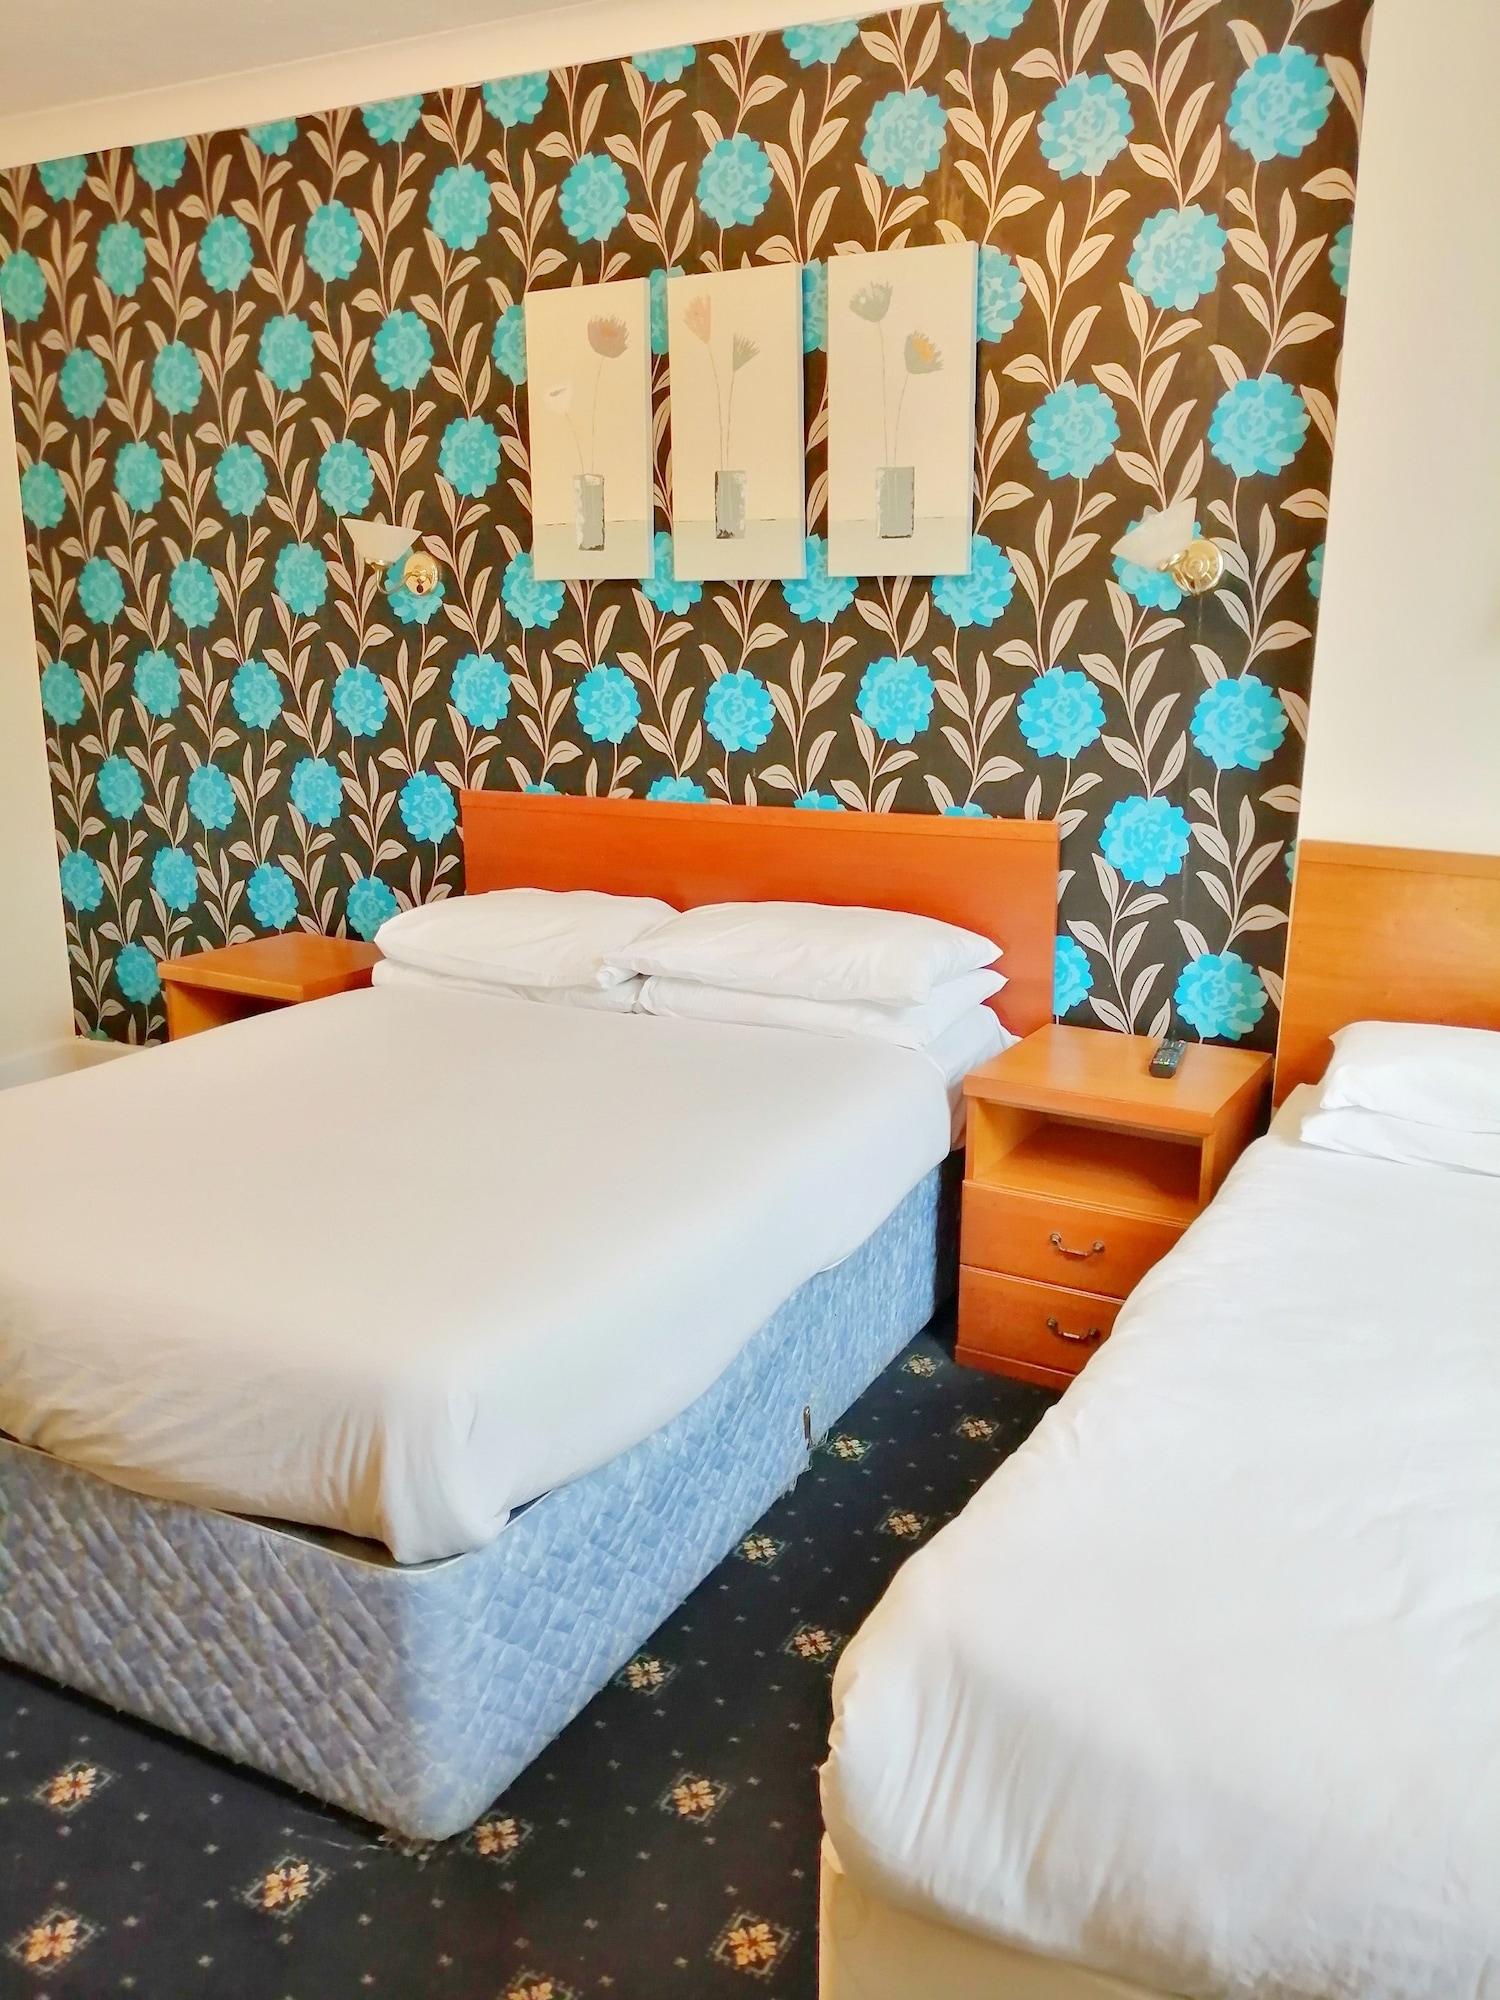 Bourne Hall Hotel, Poole